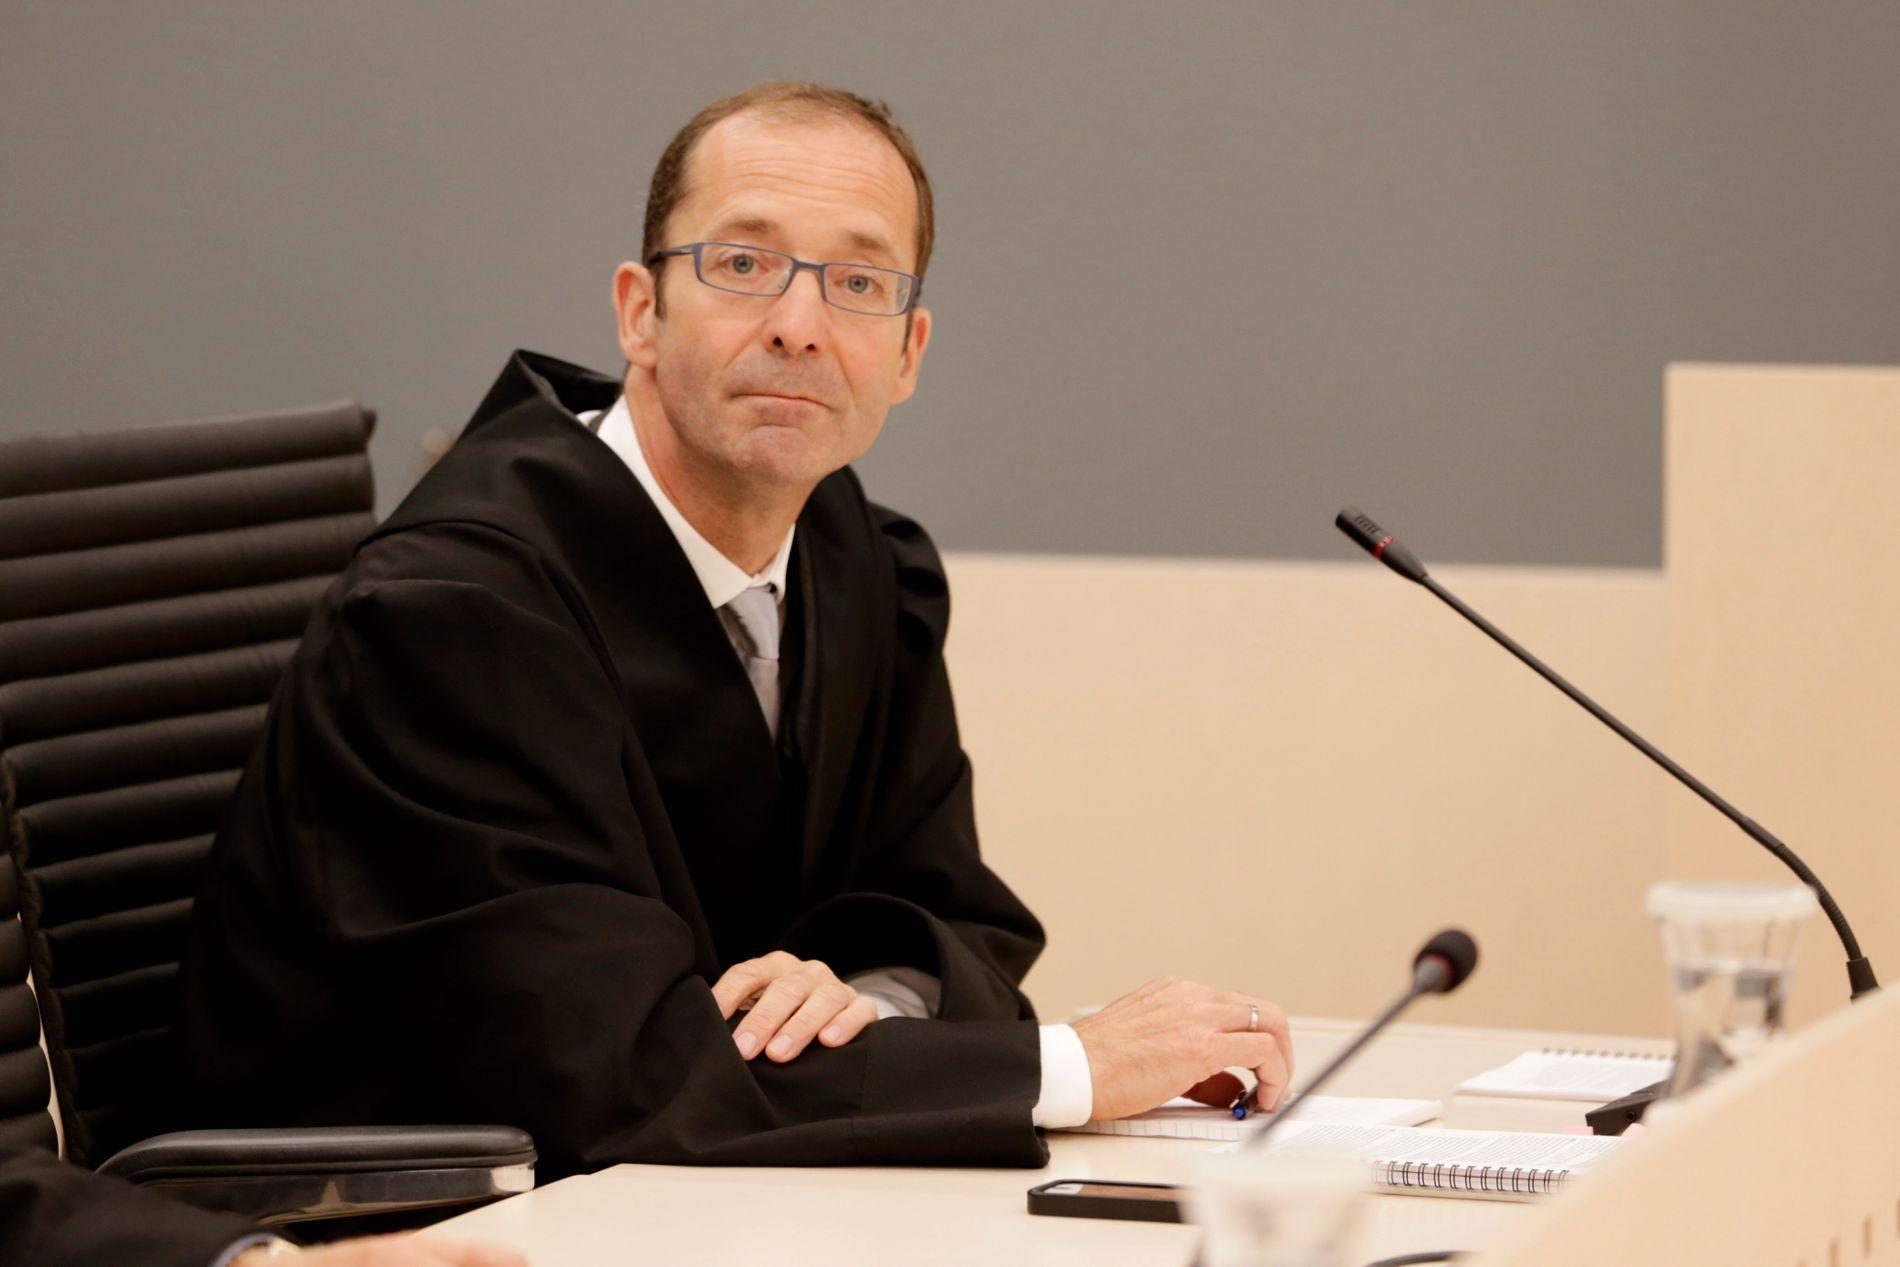 STATSADVOKAT: Carl Graff Hartmann har tatt ut tiltalen mot familiemedlemmene.